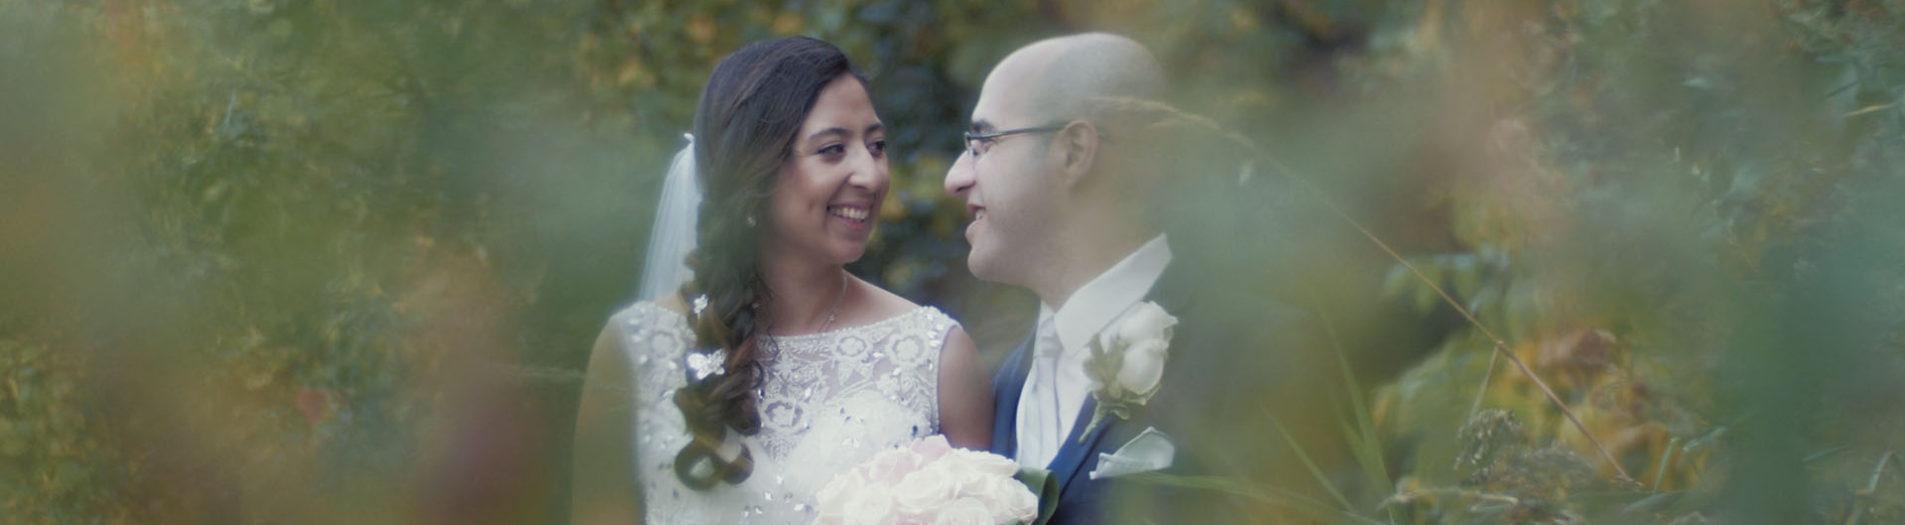 Vince + Veronica | Wedding Highlight Film